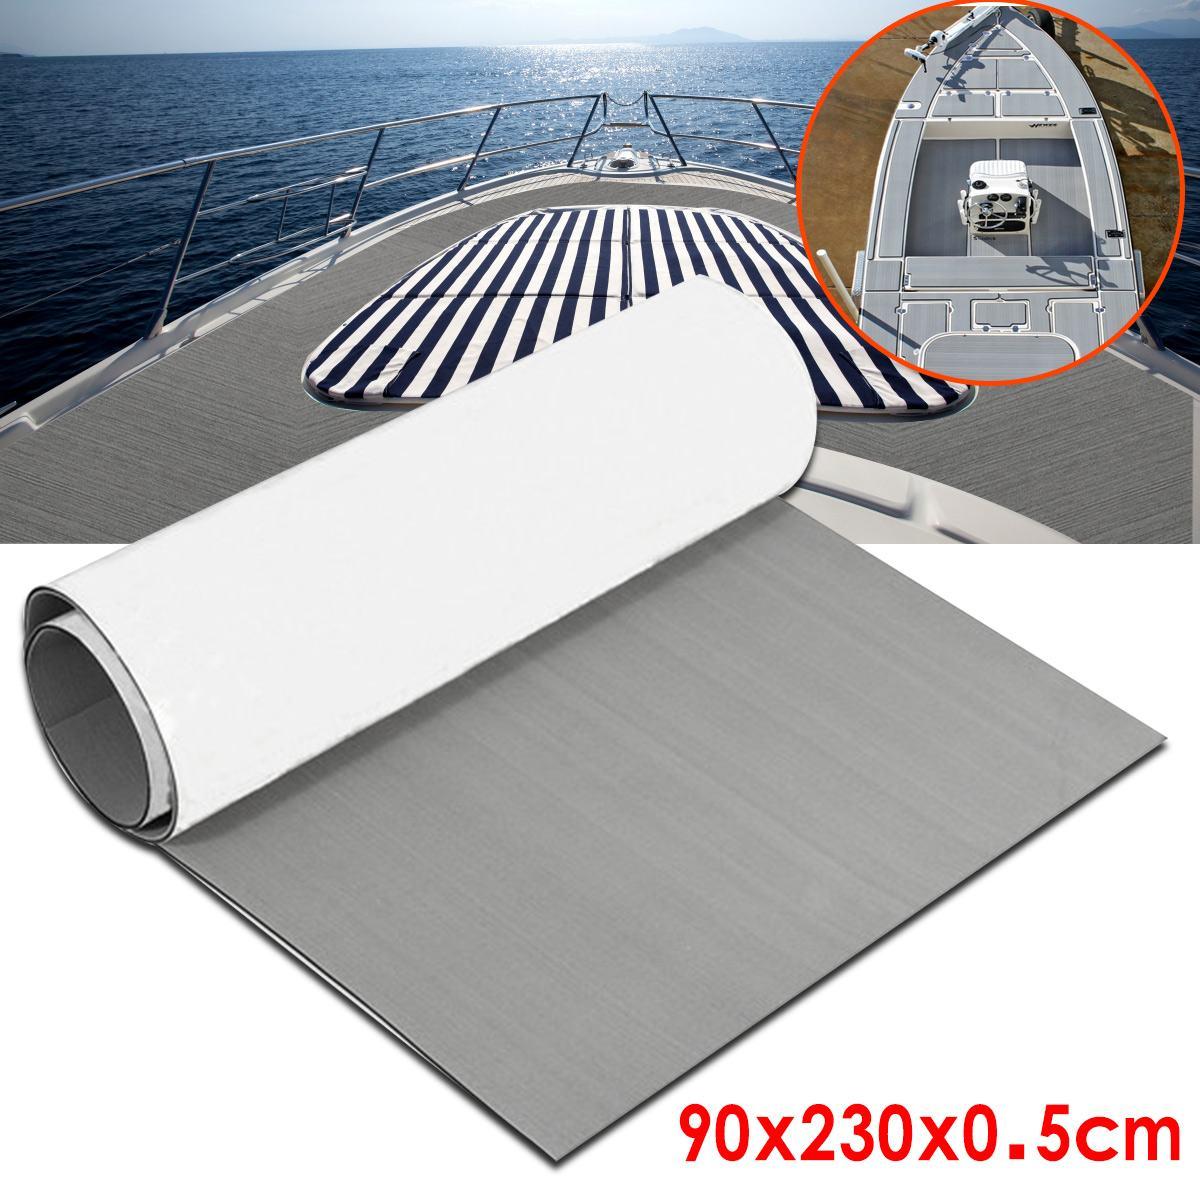 1Roll 2300x900mm 5mm Self-Adhesive EVA Foam Boat Yacht RV Caravan Marine Flooring Faux Teak Boat Decking Sheet Floor Decor Mat